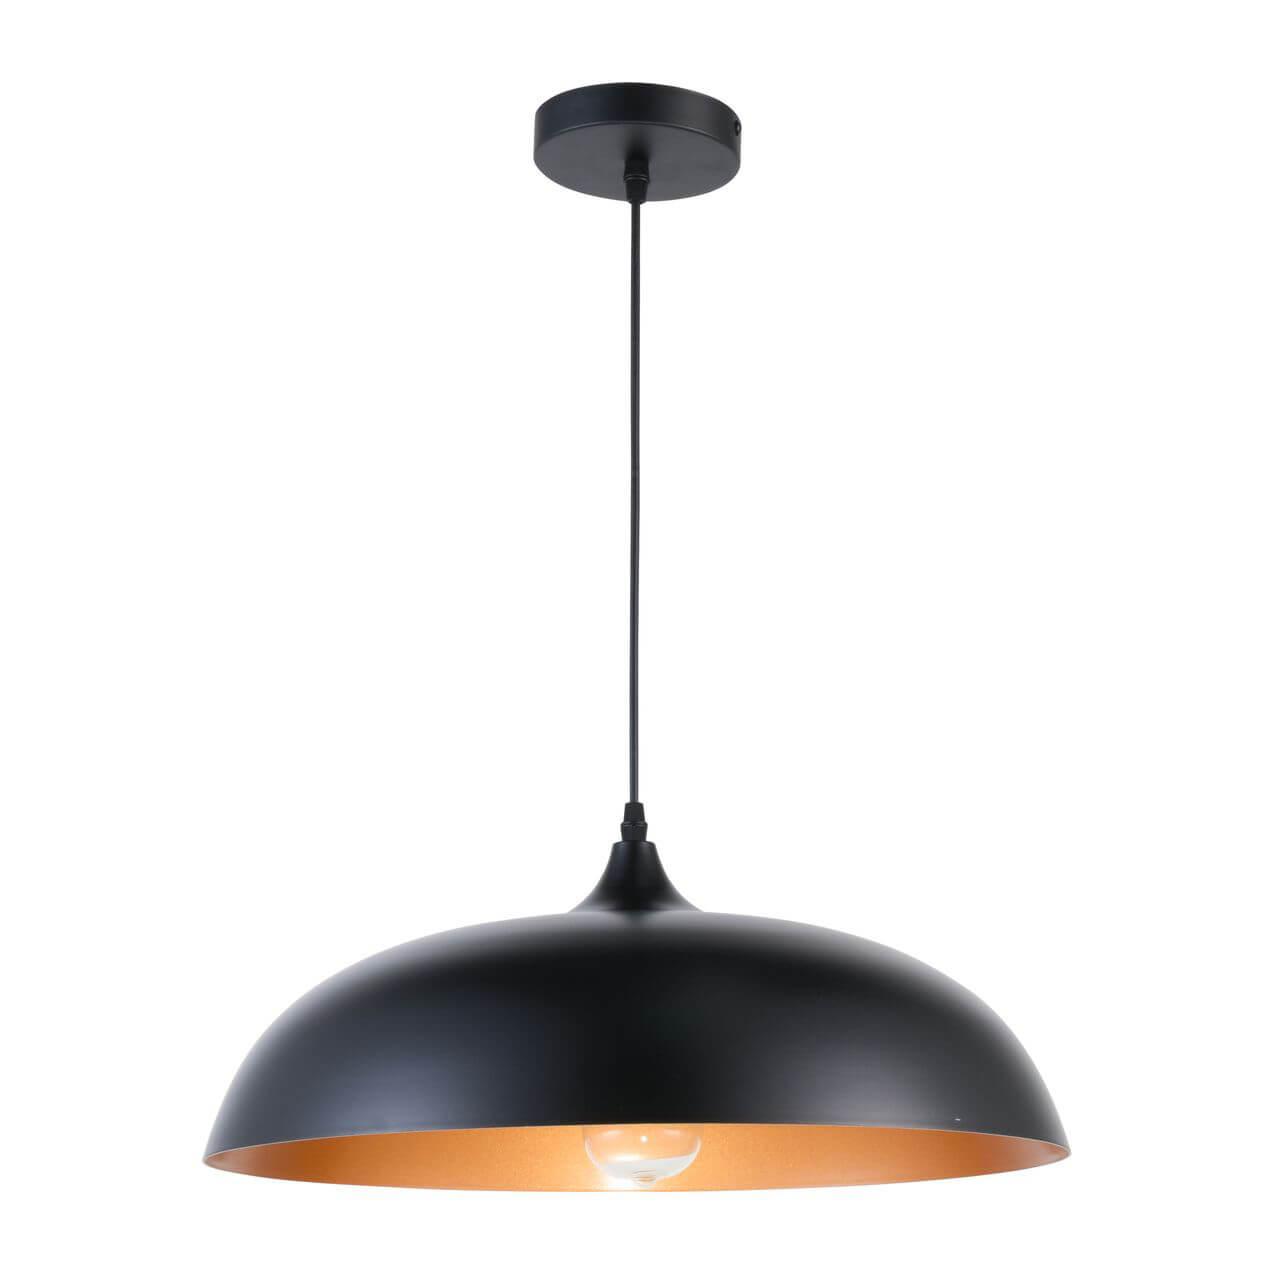 Светильник Fametto DLC-V105 E27 Black Vintage